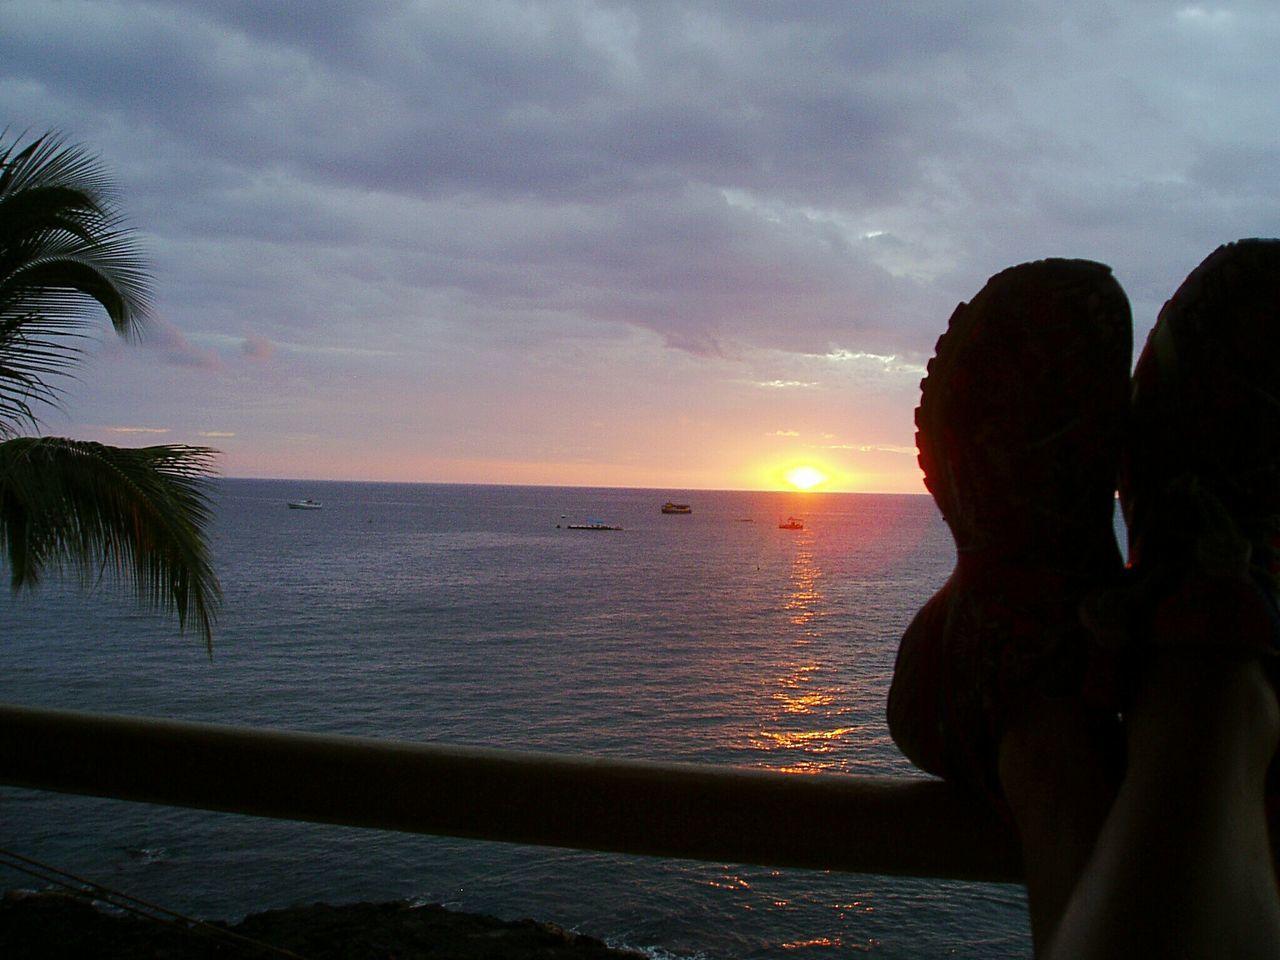 View To The Sea View To The Shore Kailua, Hawaii Kailua-Kona Coast, Hawai'i Relaxing Sunset Sundown Sun Set Sunset Sky Sunset Ocean View From Balcony Seascape Enjoying Life The Beauty Of Nature Living The Dream Scenics Feel The Journey 43 Golden Moments